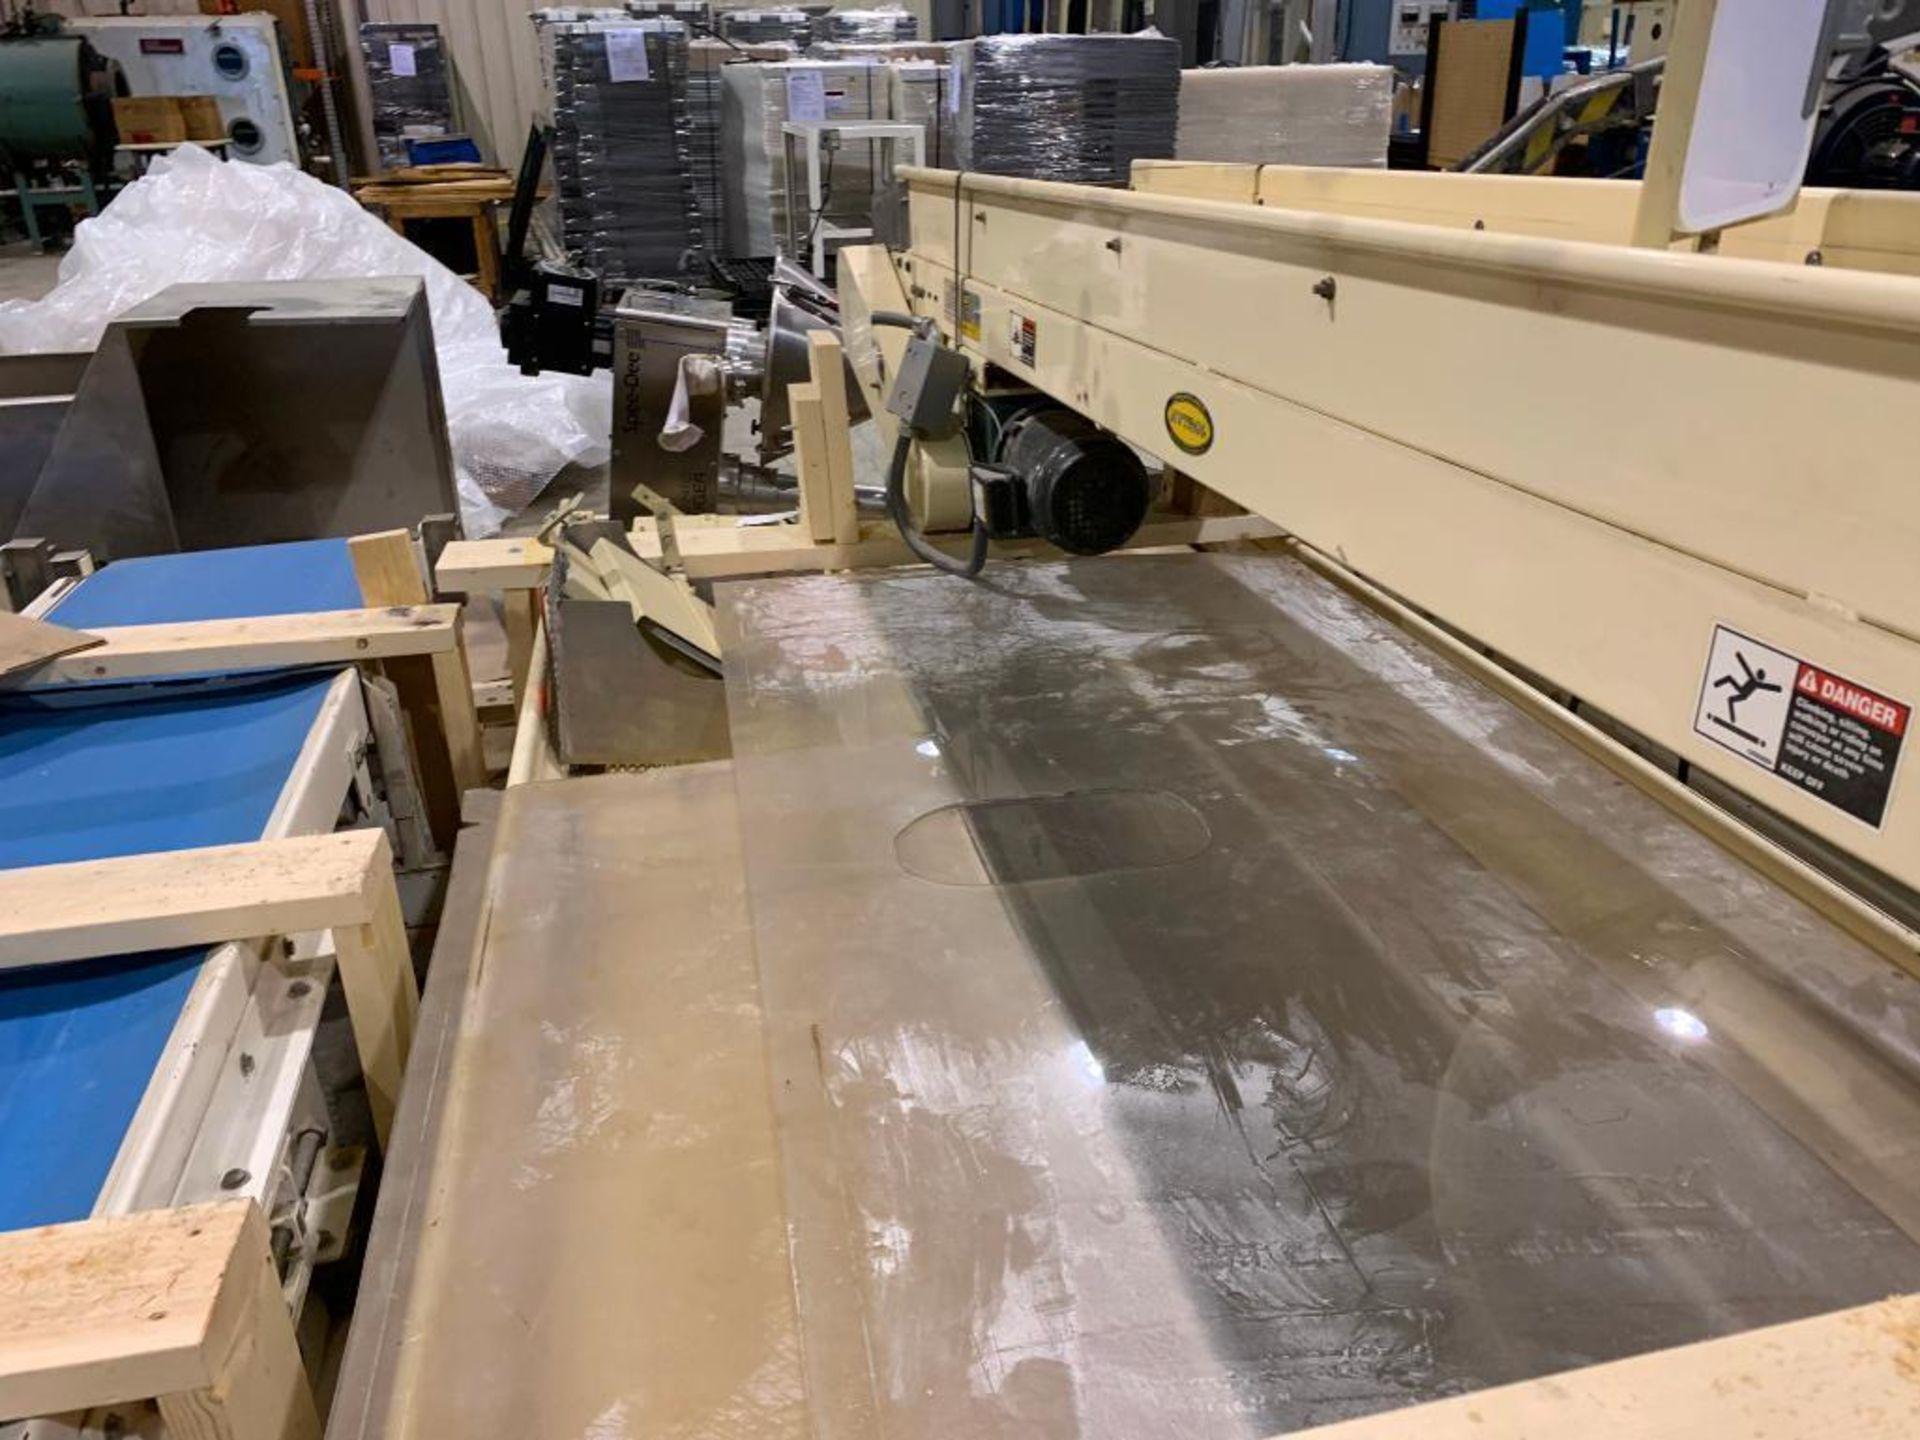 Lot 153 - Mild steel conveyor frame on skid. (Located in Kenosha, WI)